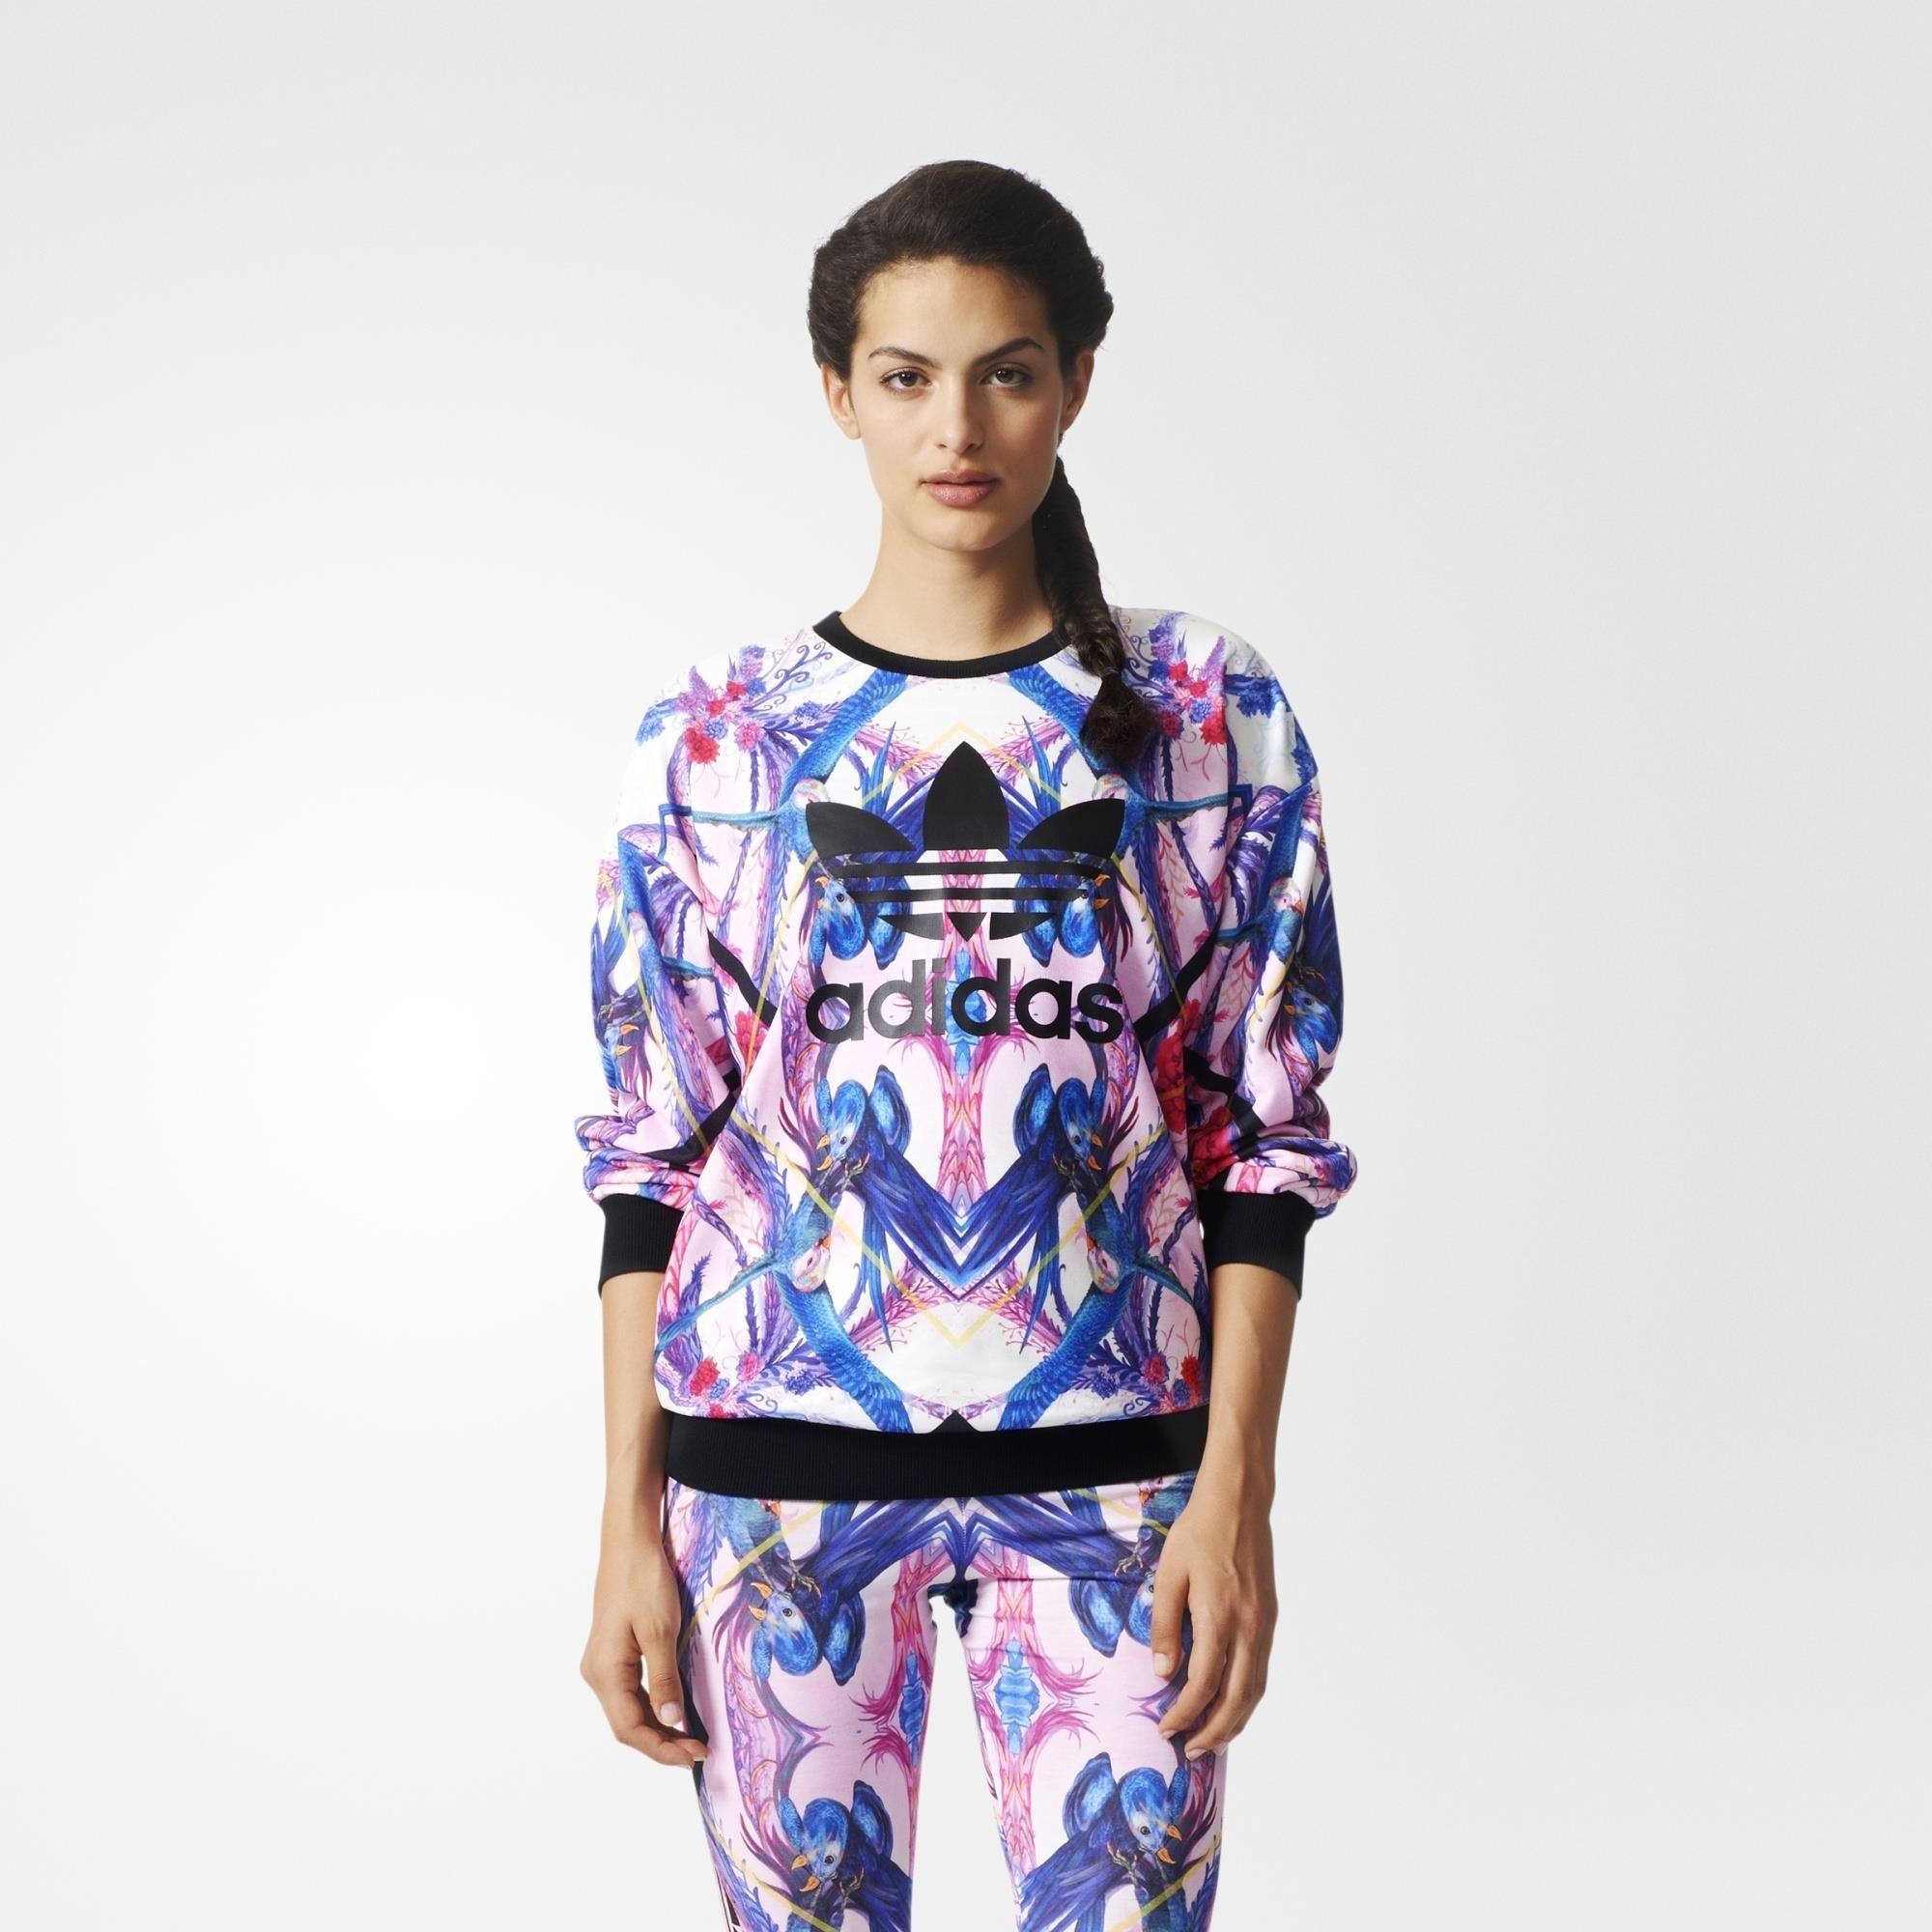 Adidas Sweatshirt Mehrfarbig Adidas Deutschland Clothes Sweatshirts Clothes Design [ 2000 x 2000 Pixel ]